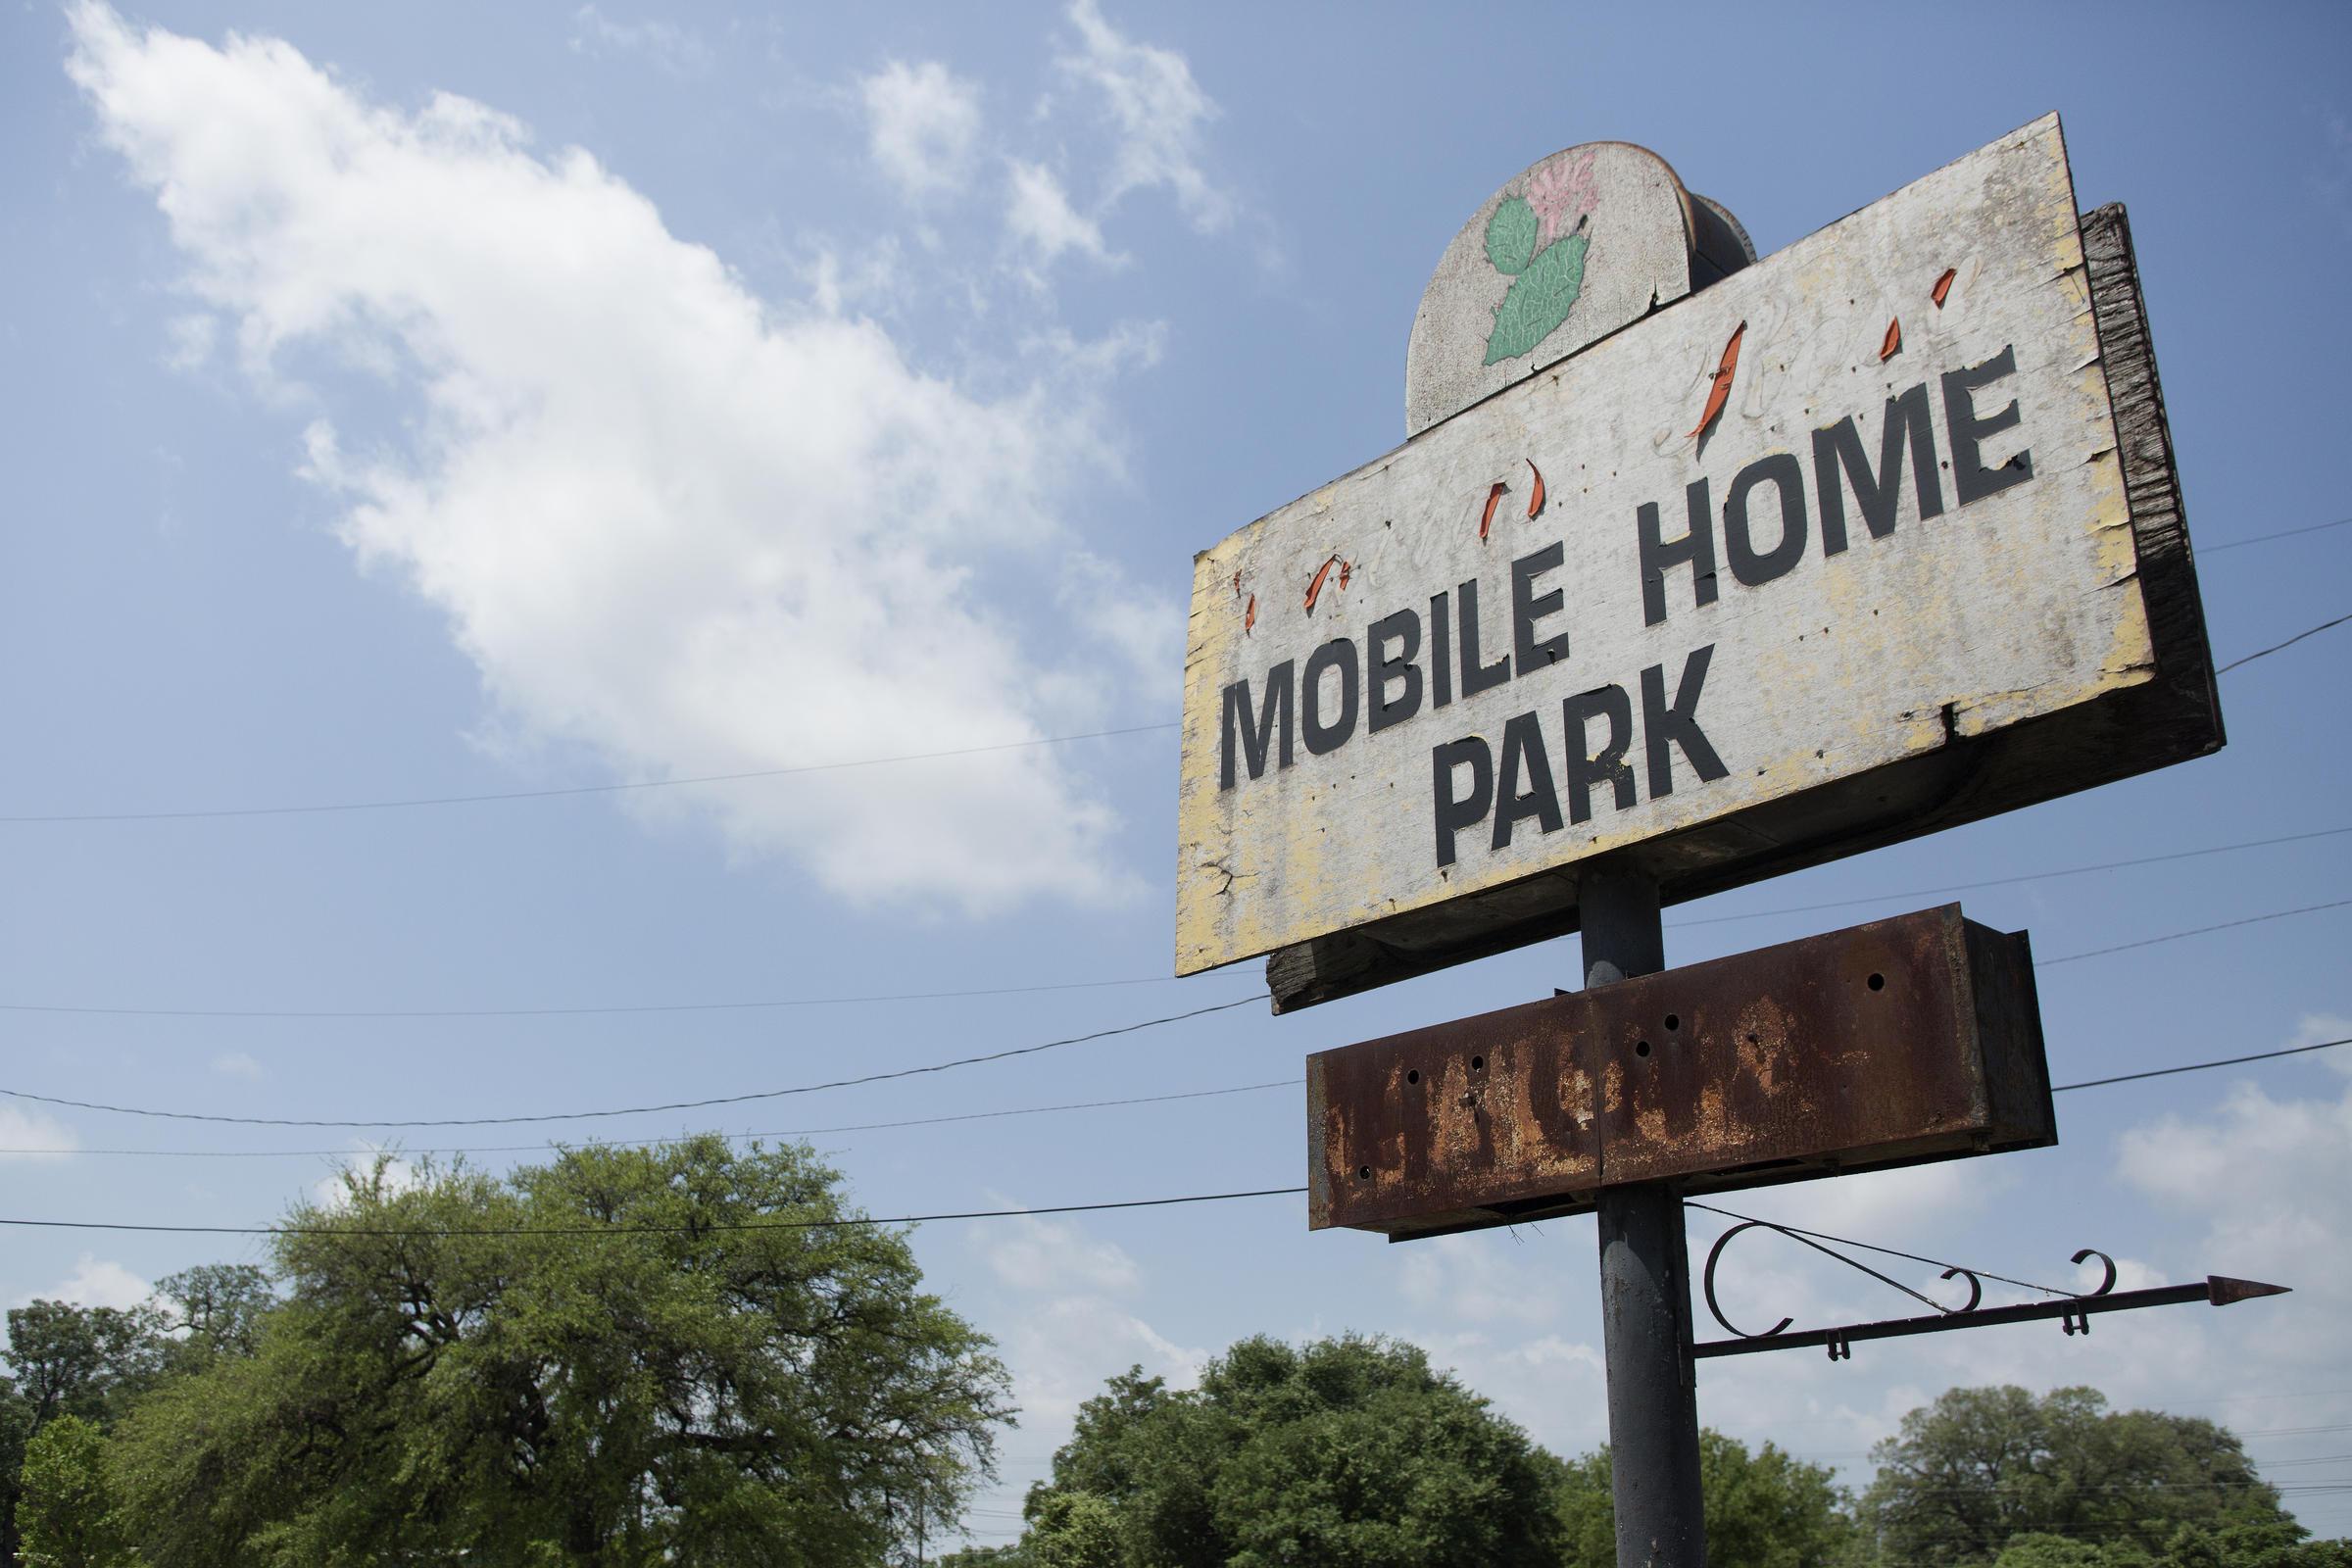 Council Approves Cactus Rose Mobile Home Park Rezoning KUT - Mobile home park